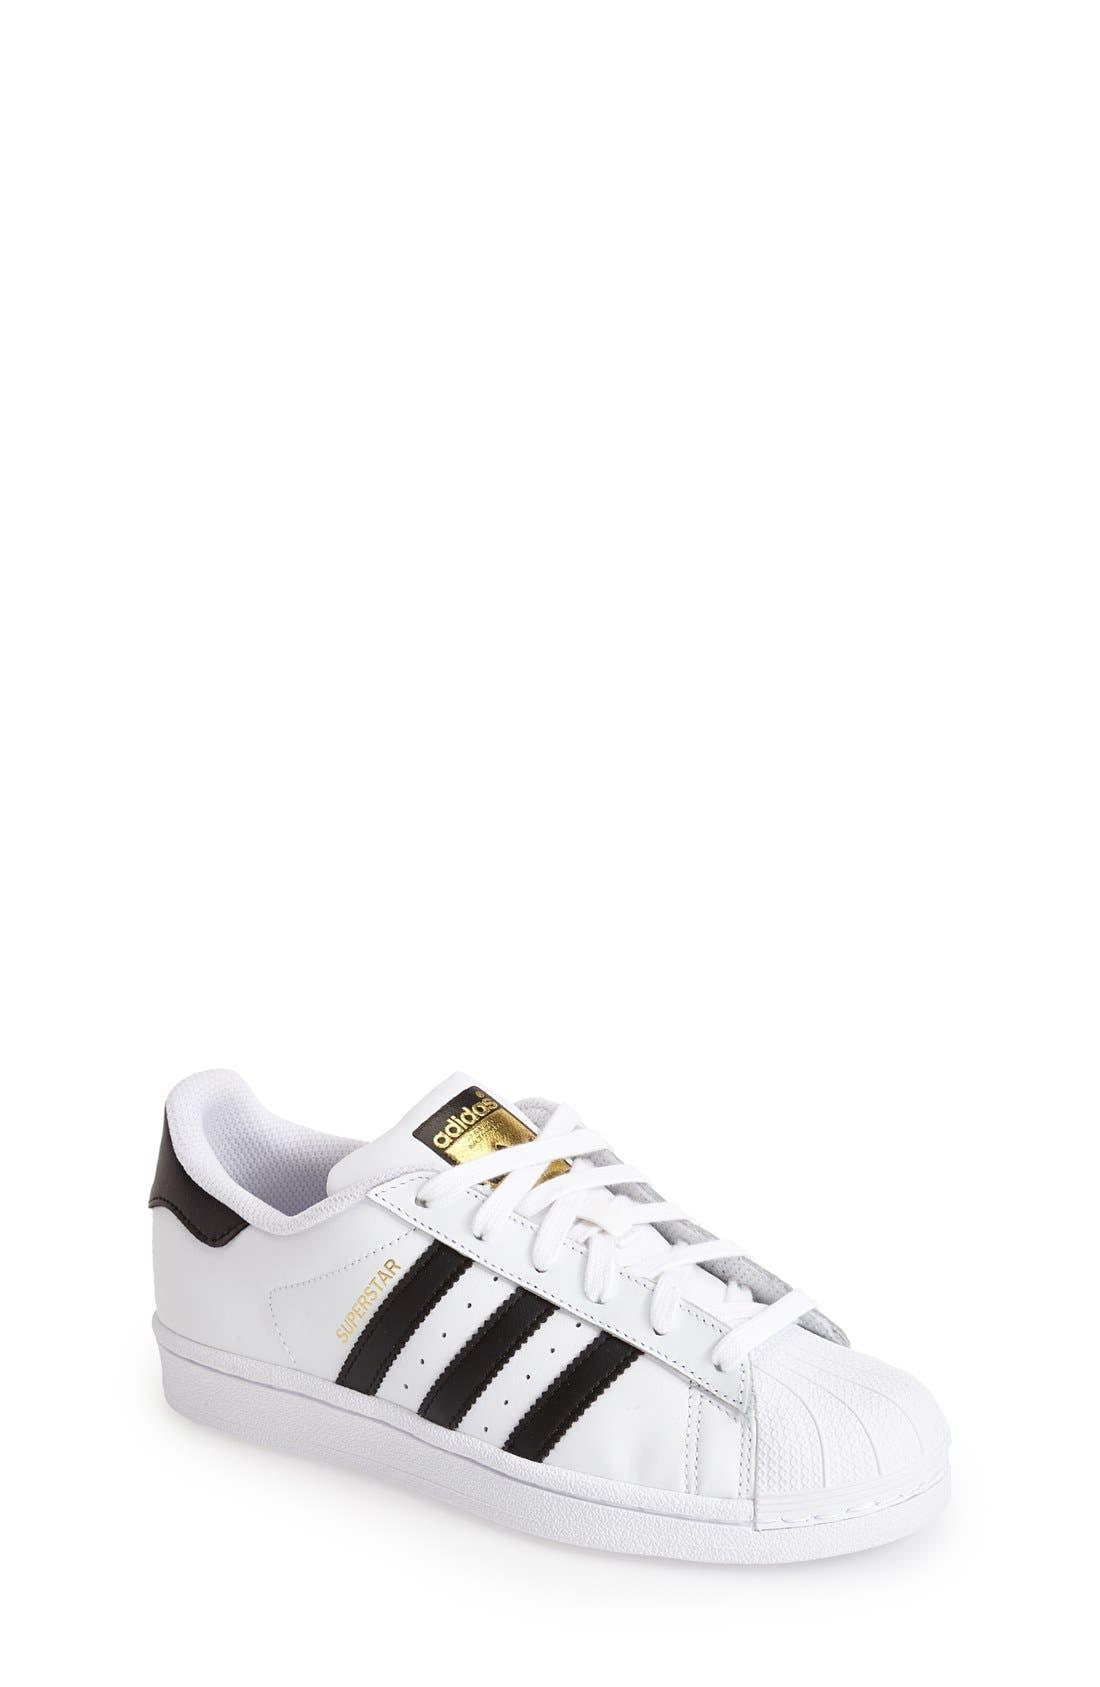 ADIDAS, 'Superstar II' Sneaker, Main thumbnail 1, color, WHITE/ BLACK/ WHITE